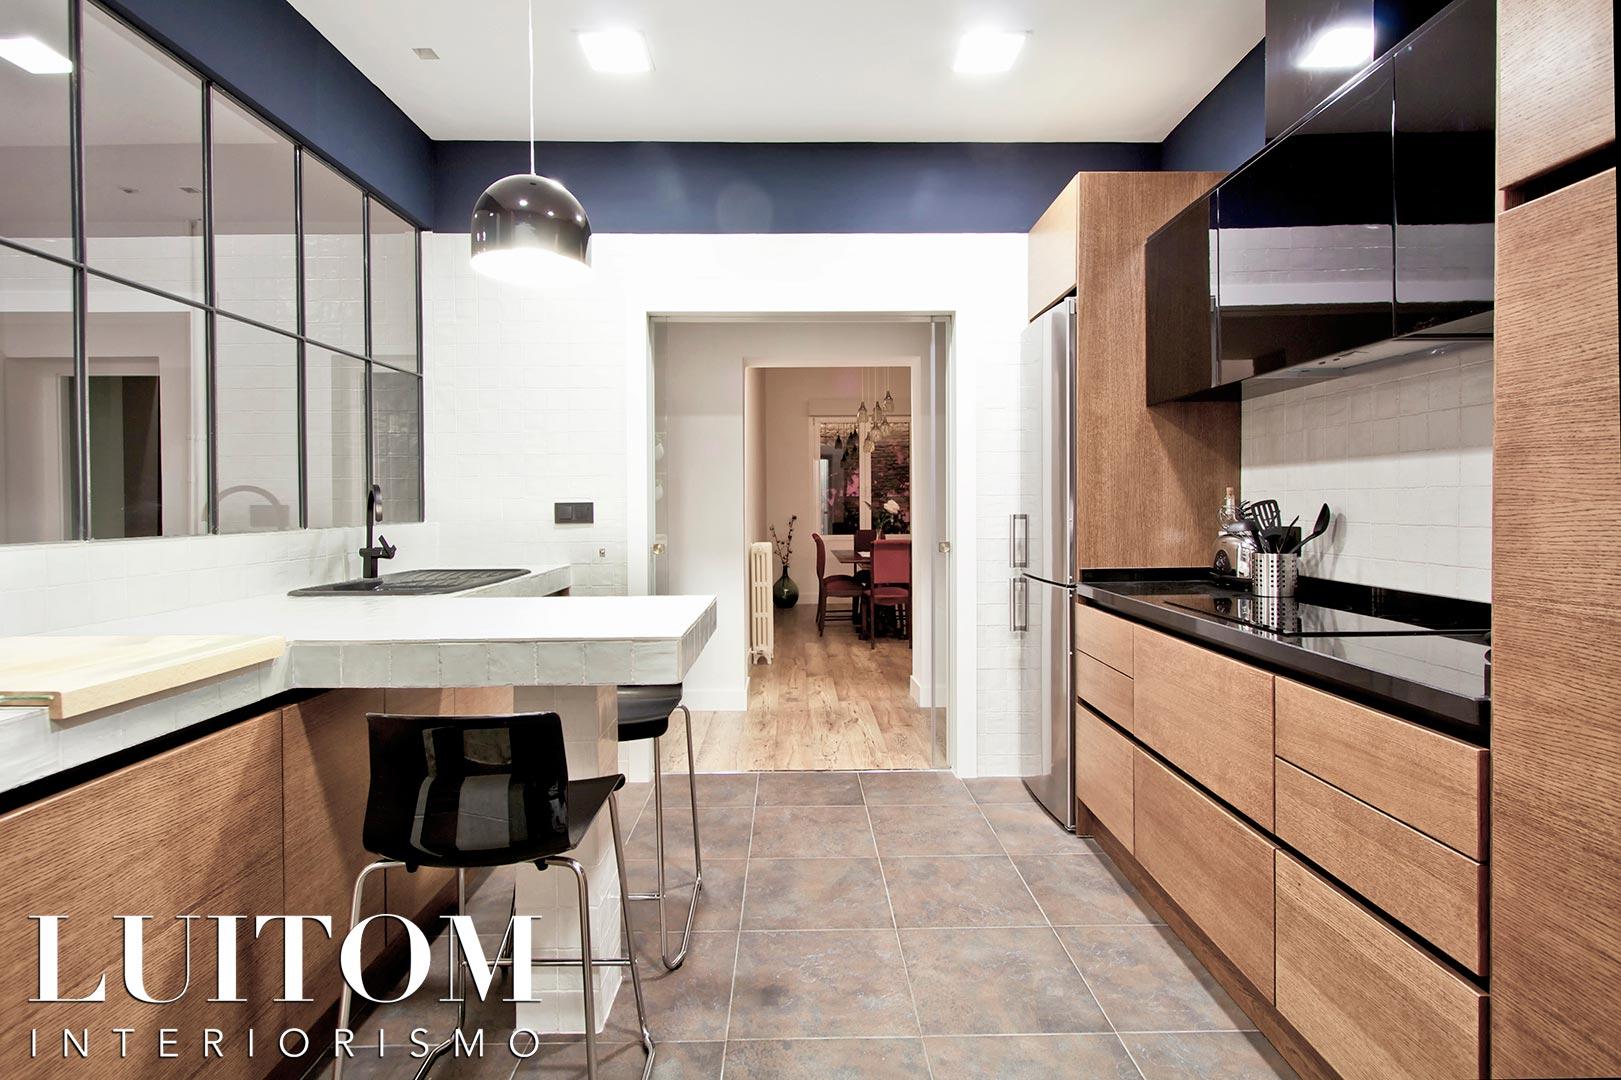 mobiliario-cocina-rechapado-madera-natural-cocinas-elegantes-negro-madera